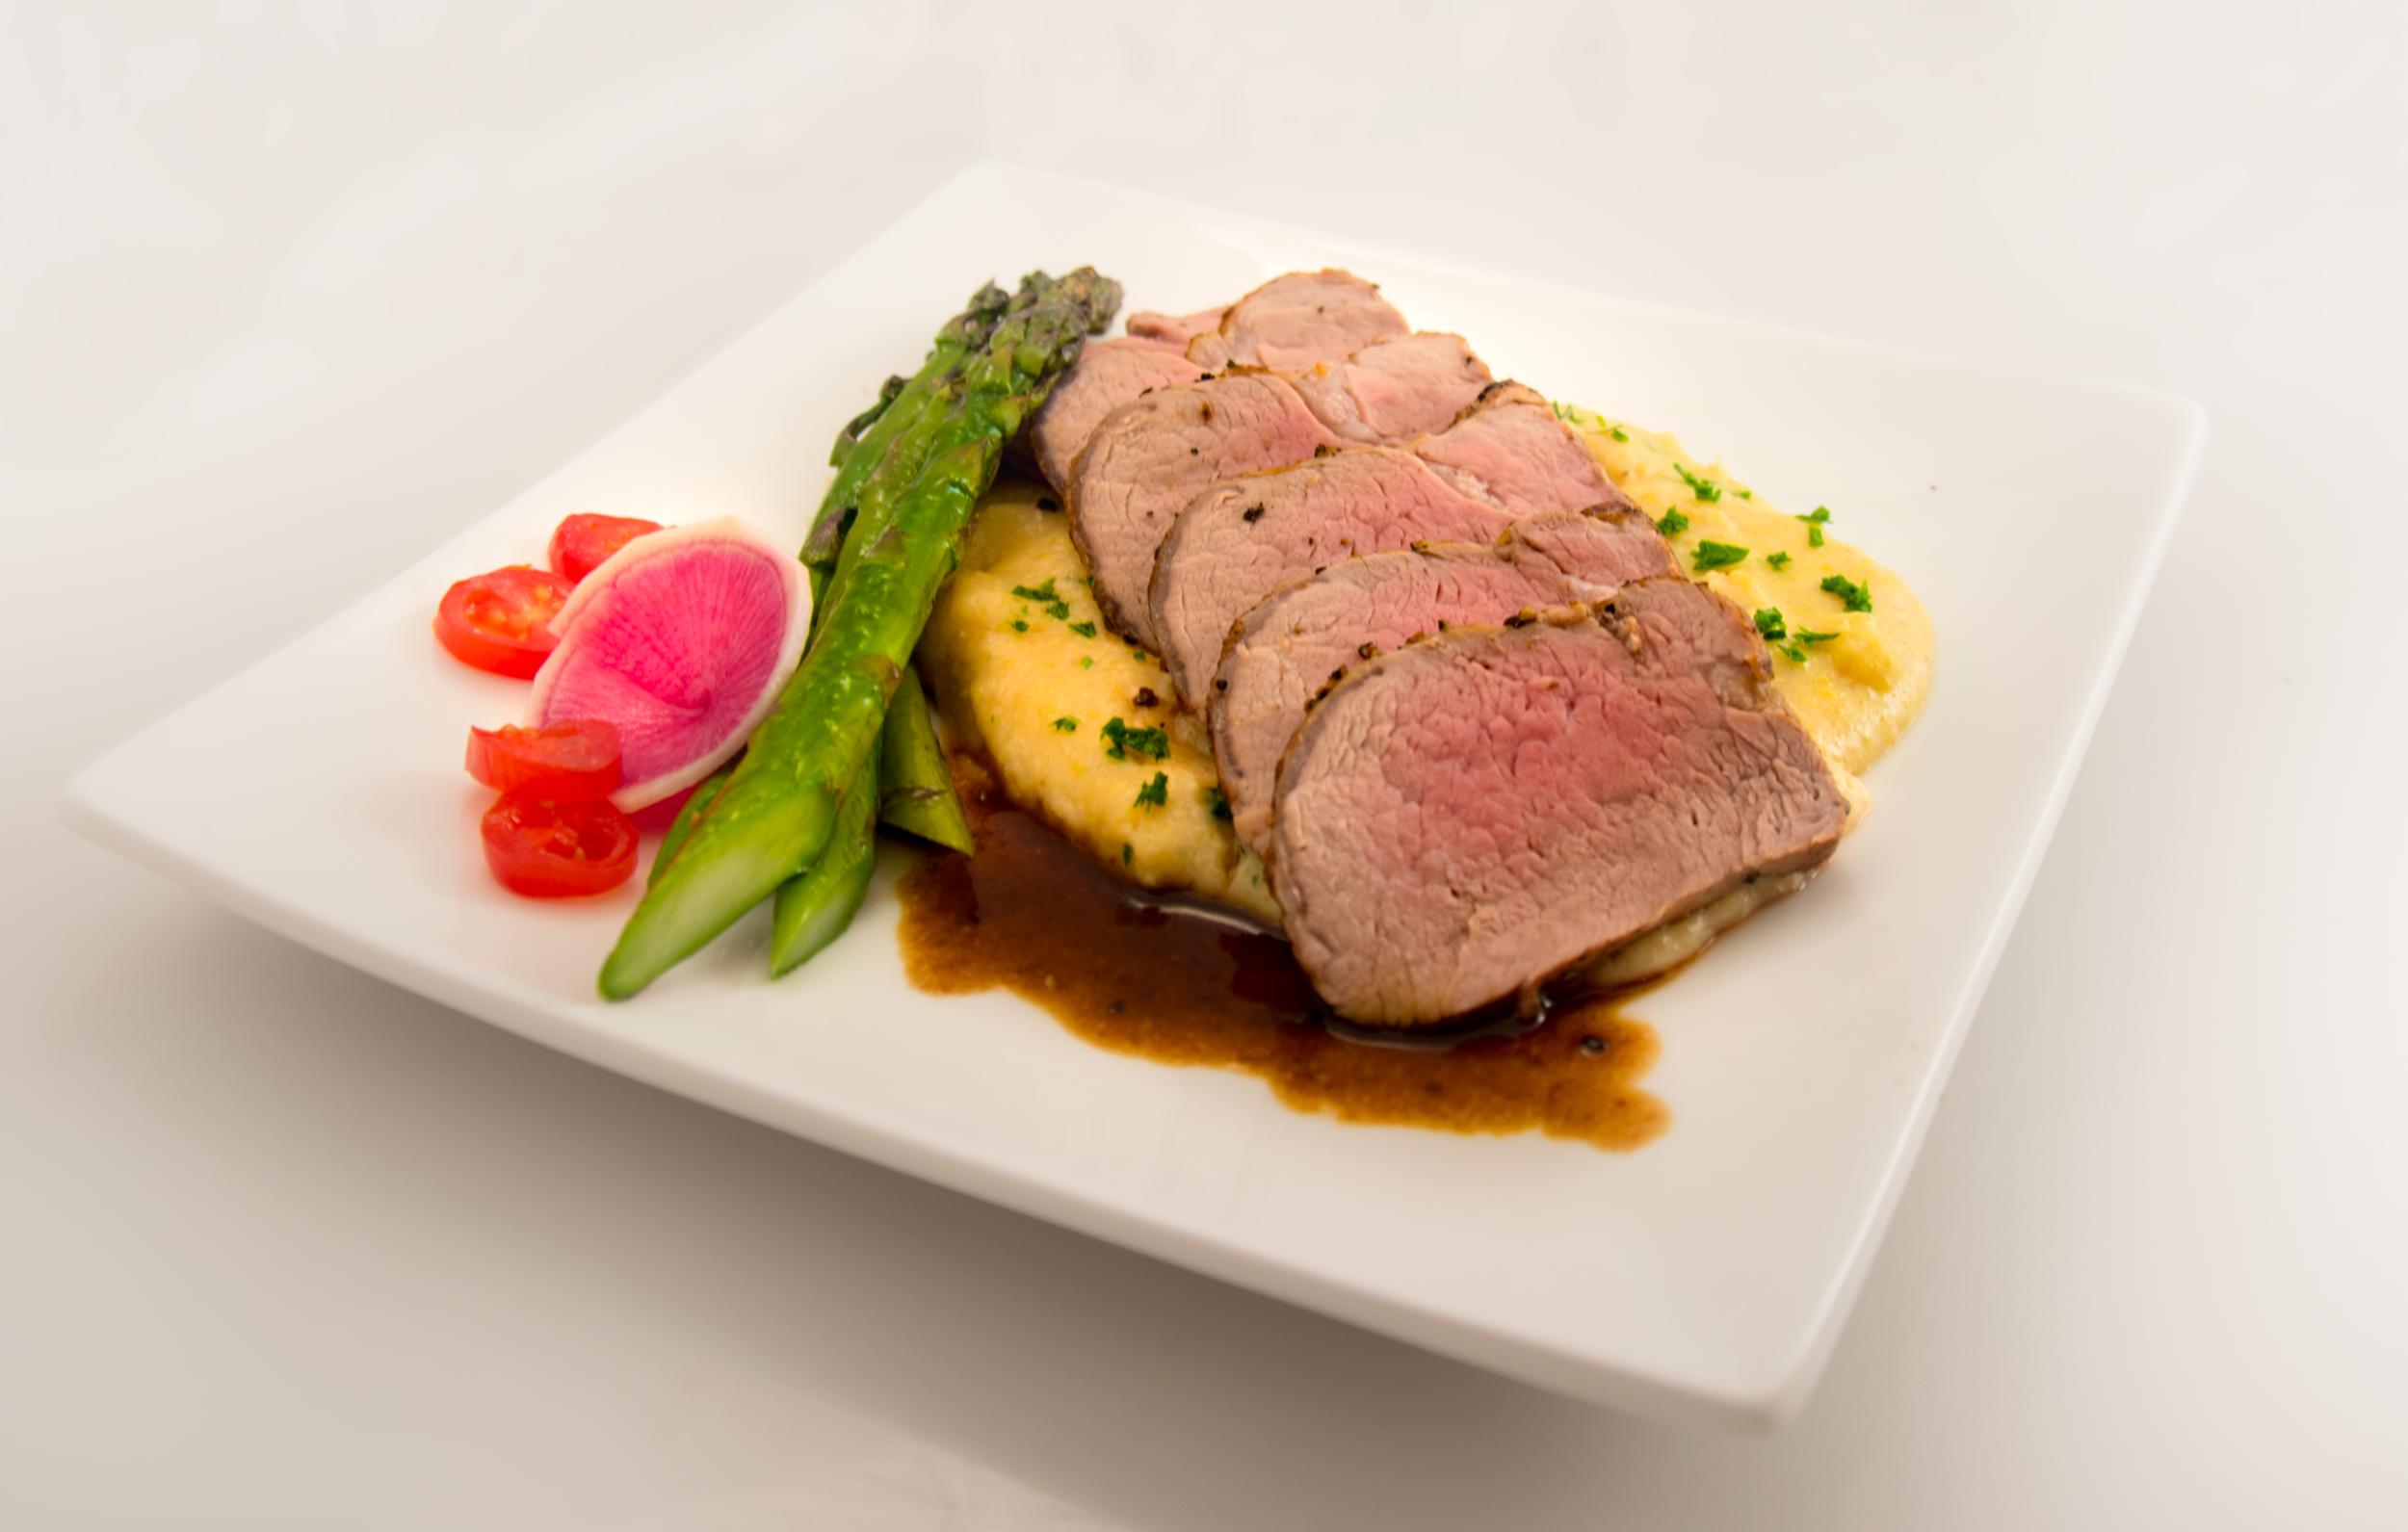 Roast pork tenderloin slices in an entrée  User:Ɱ  - Own work